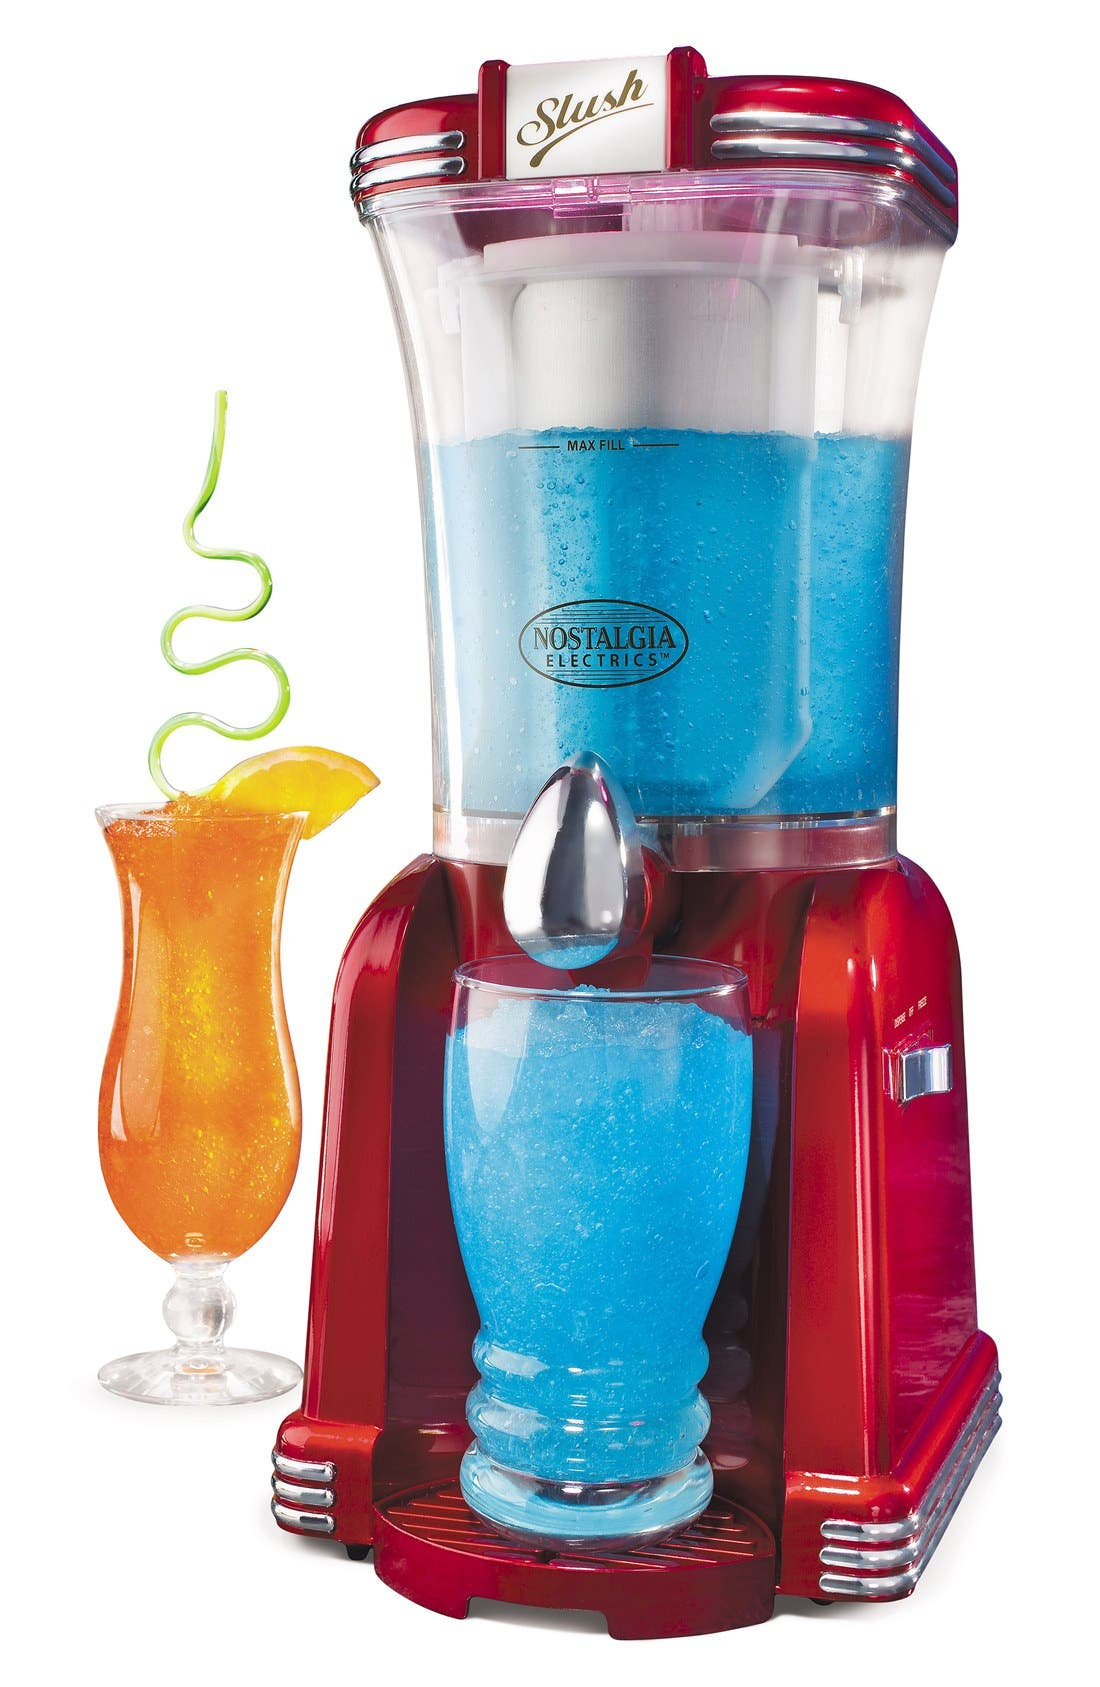 Main Image - Nostalgia Electrics 'Retro Series' Slush Drink Maker